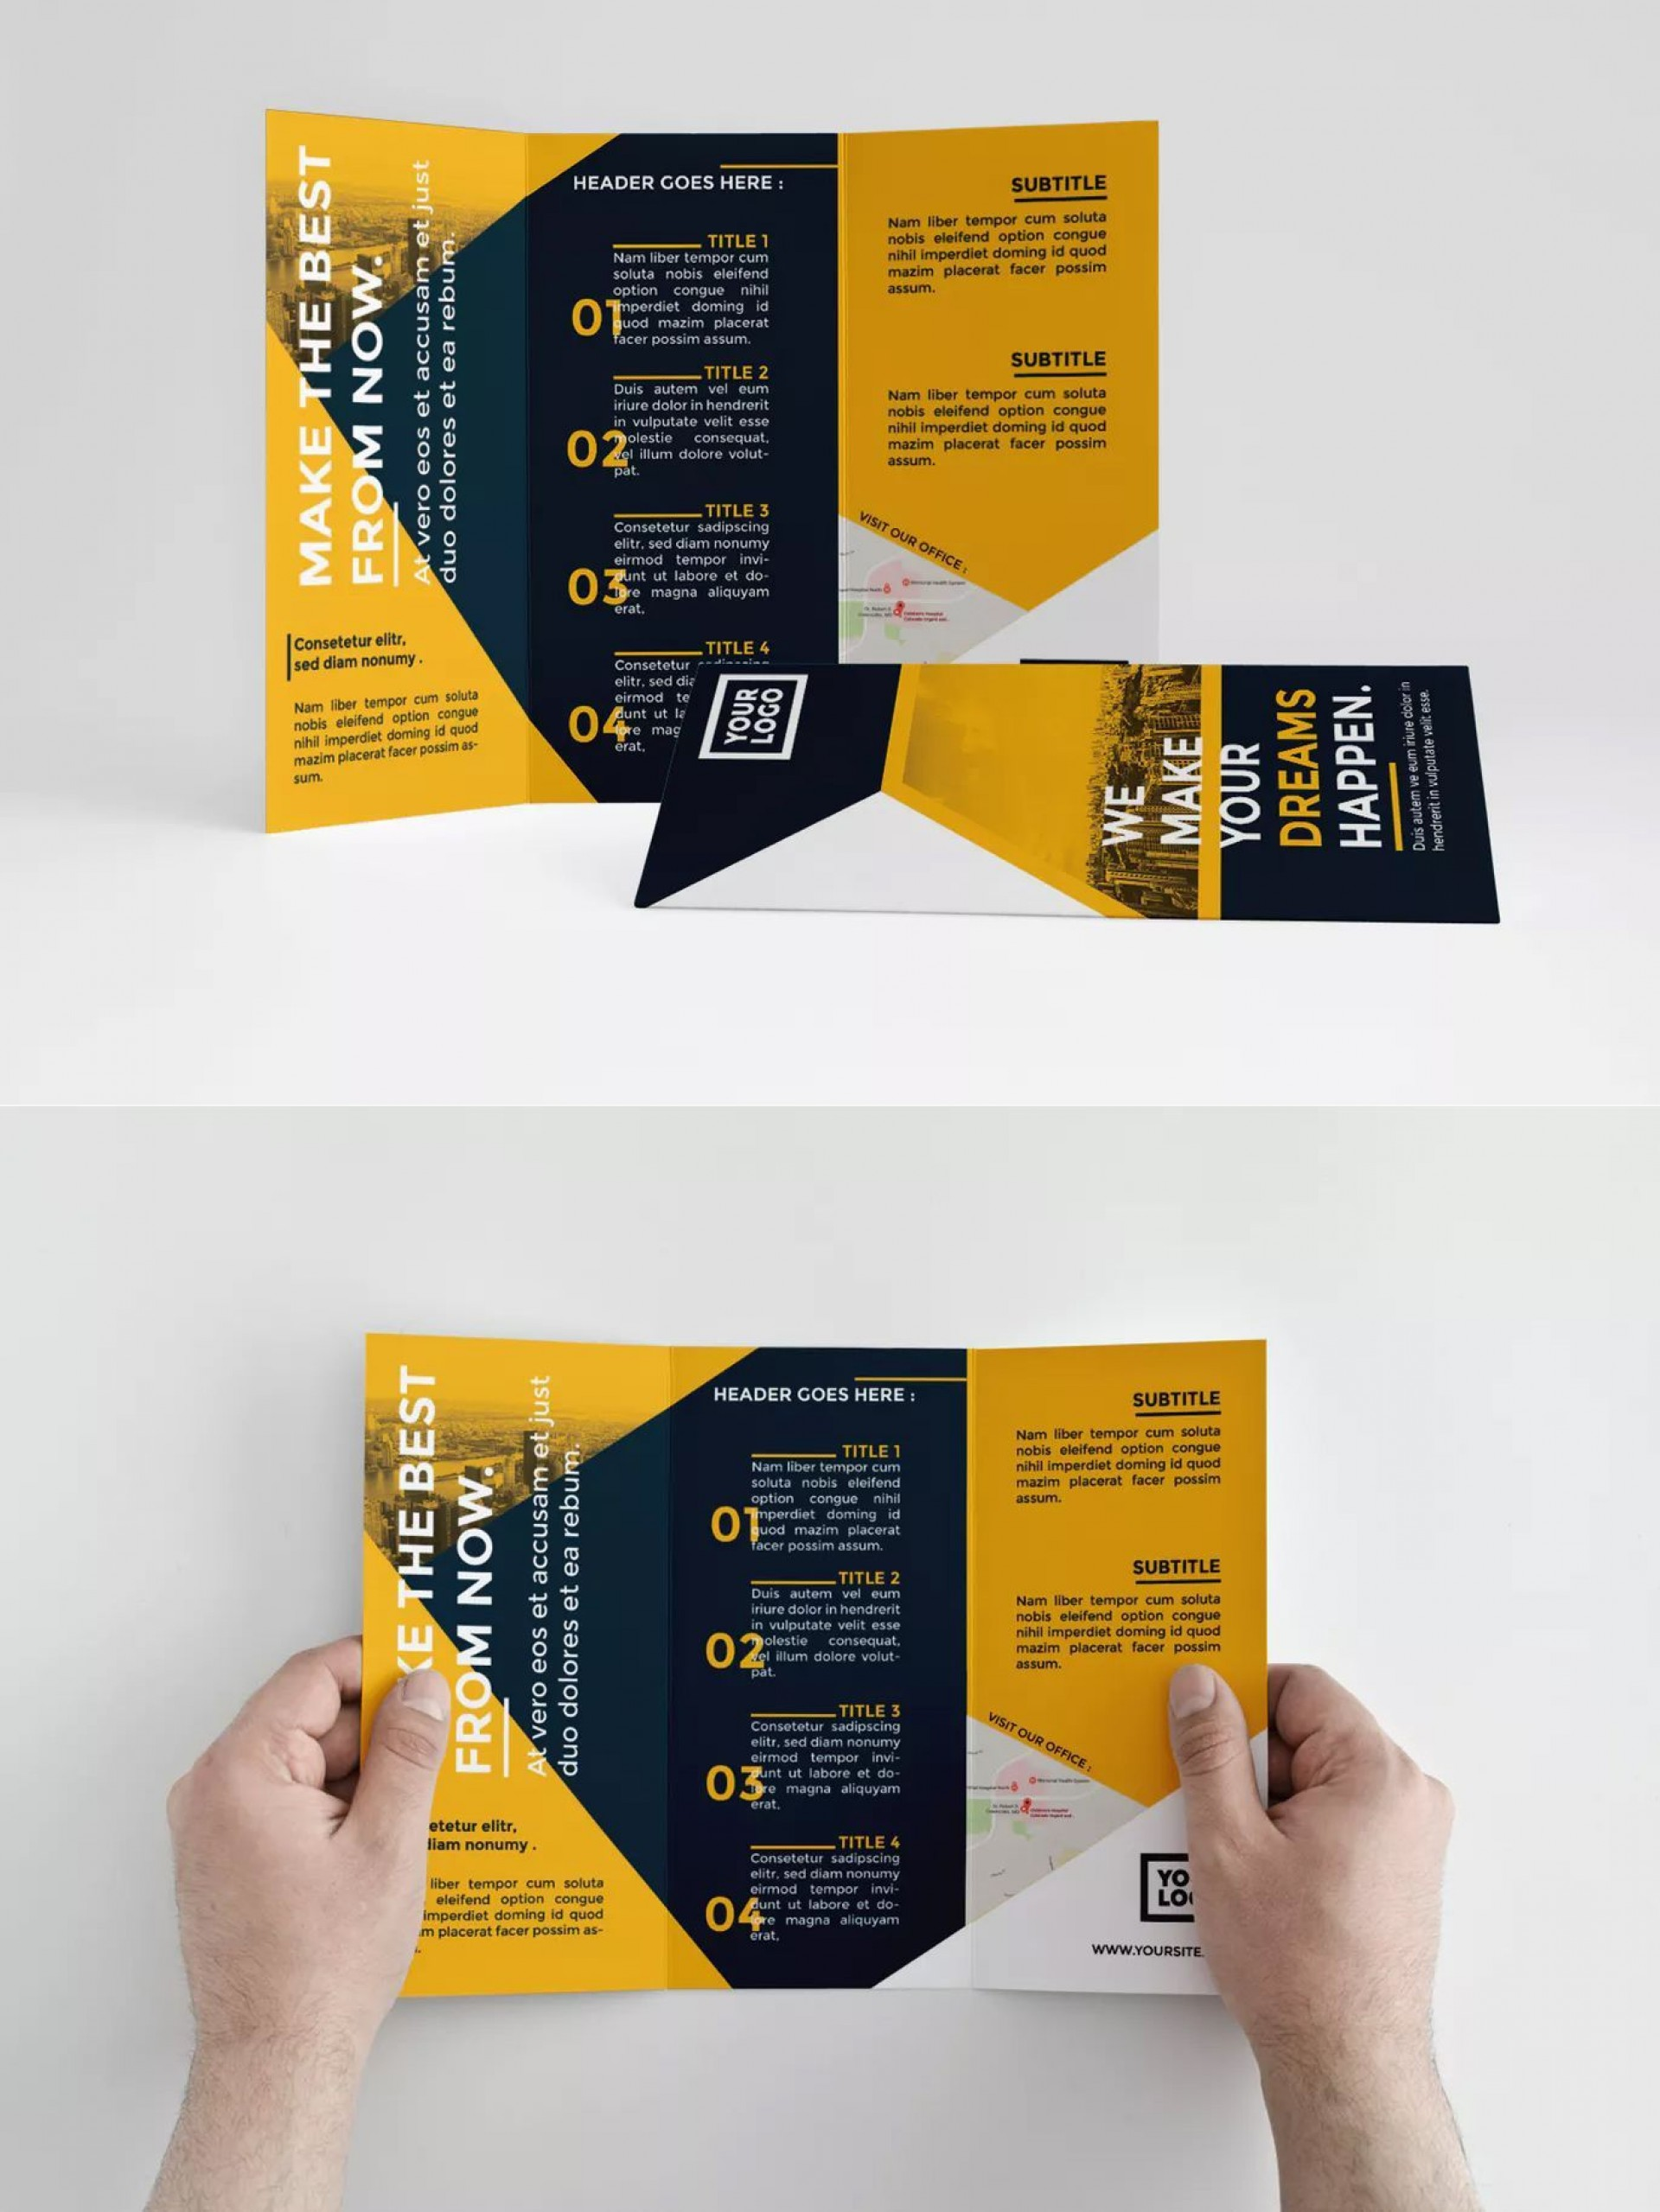 000 Shocking Indesign Trifold Brochure Template Inspiration  Tri Fold A4 Bi Free Download1920